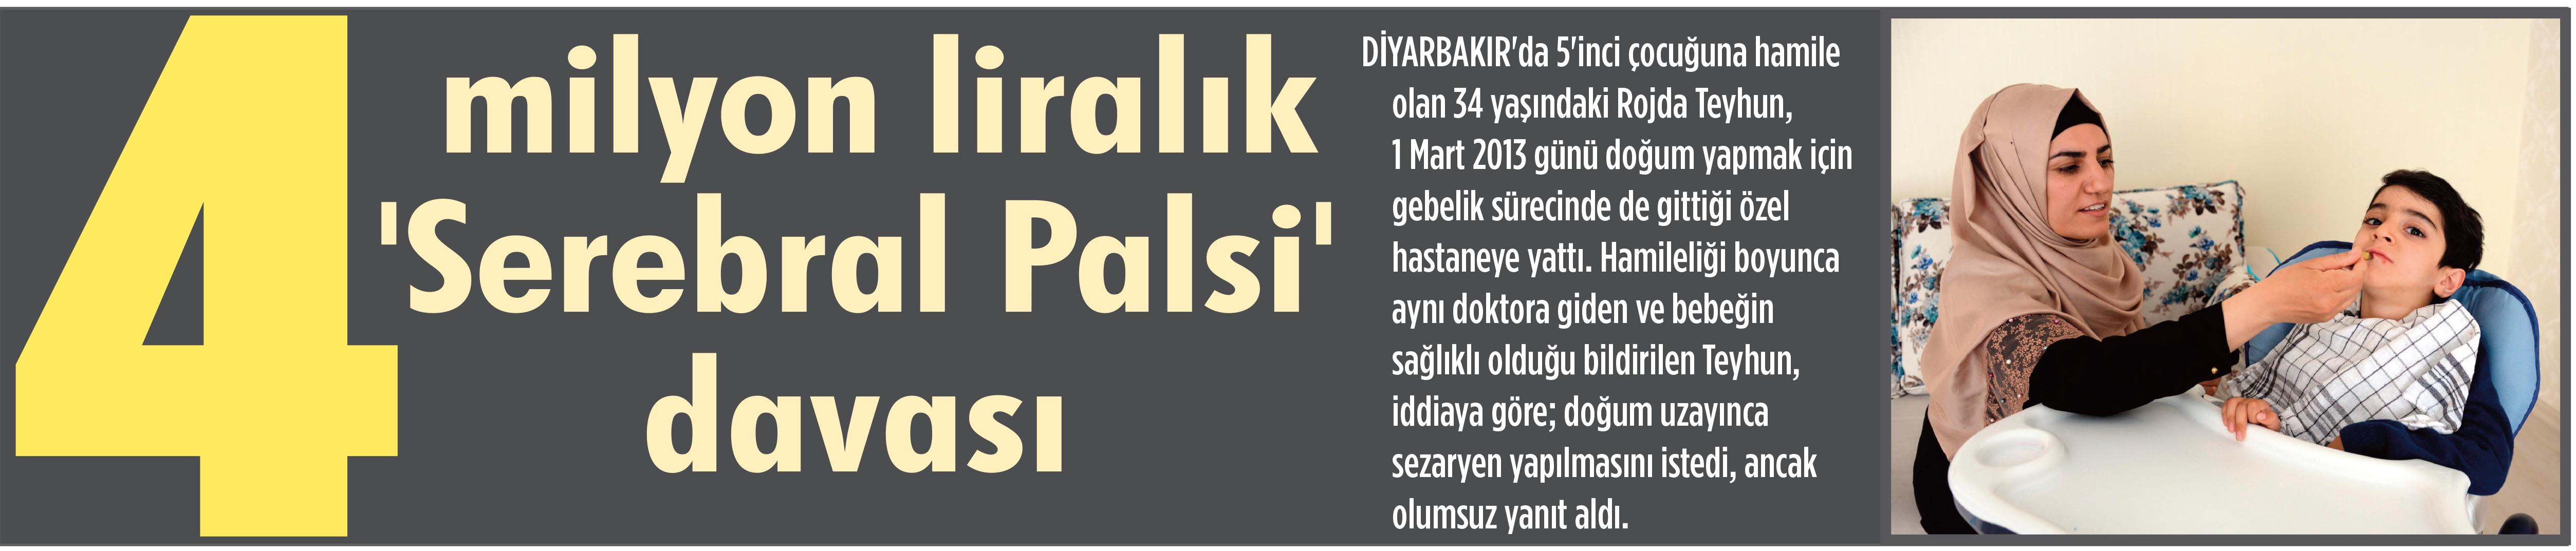 4 milyon liralık 'Serebral Palsi' davası